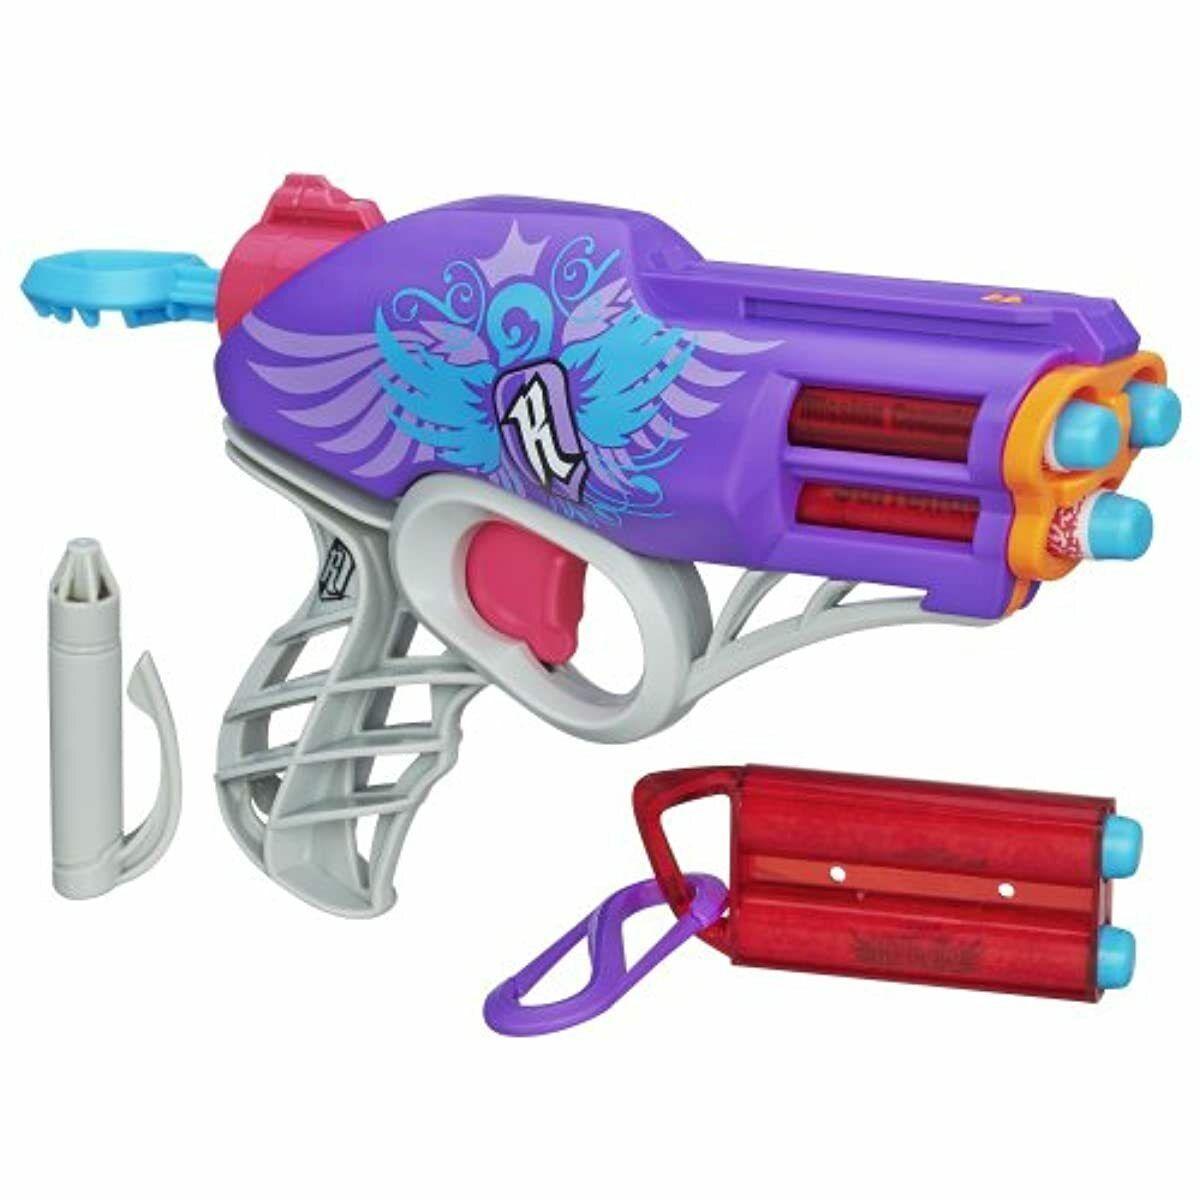 Nerf Rebel Rebelle Nerf Guns for Boys 6 7 8 10 11 12 Year yr